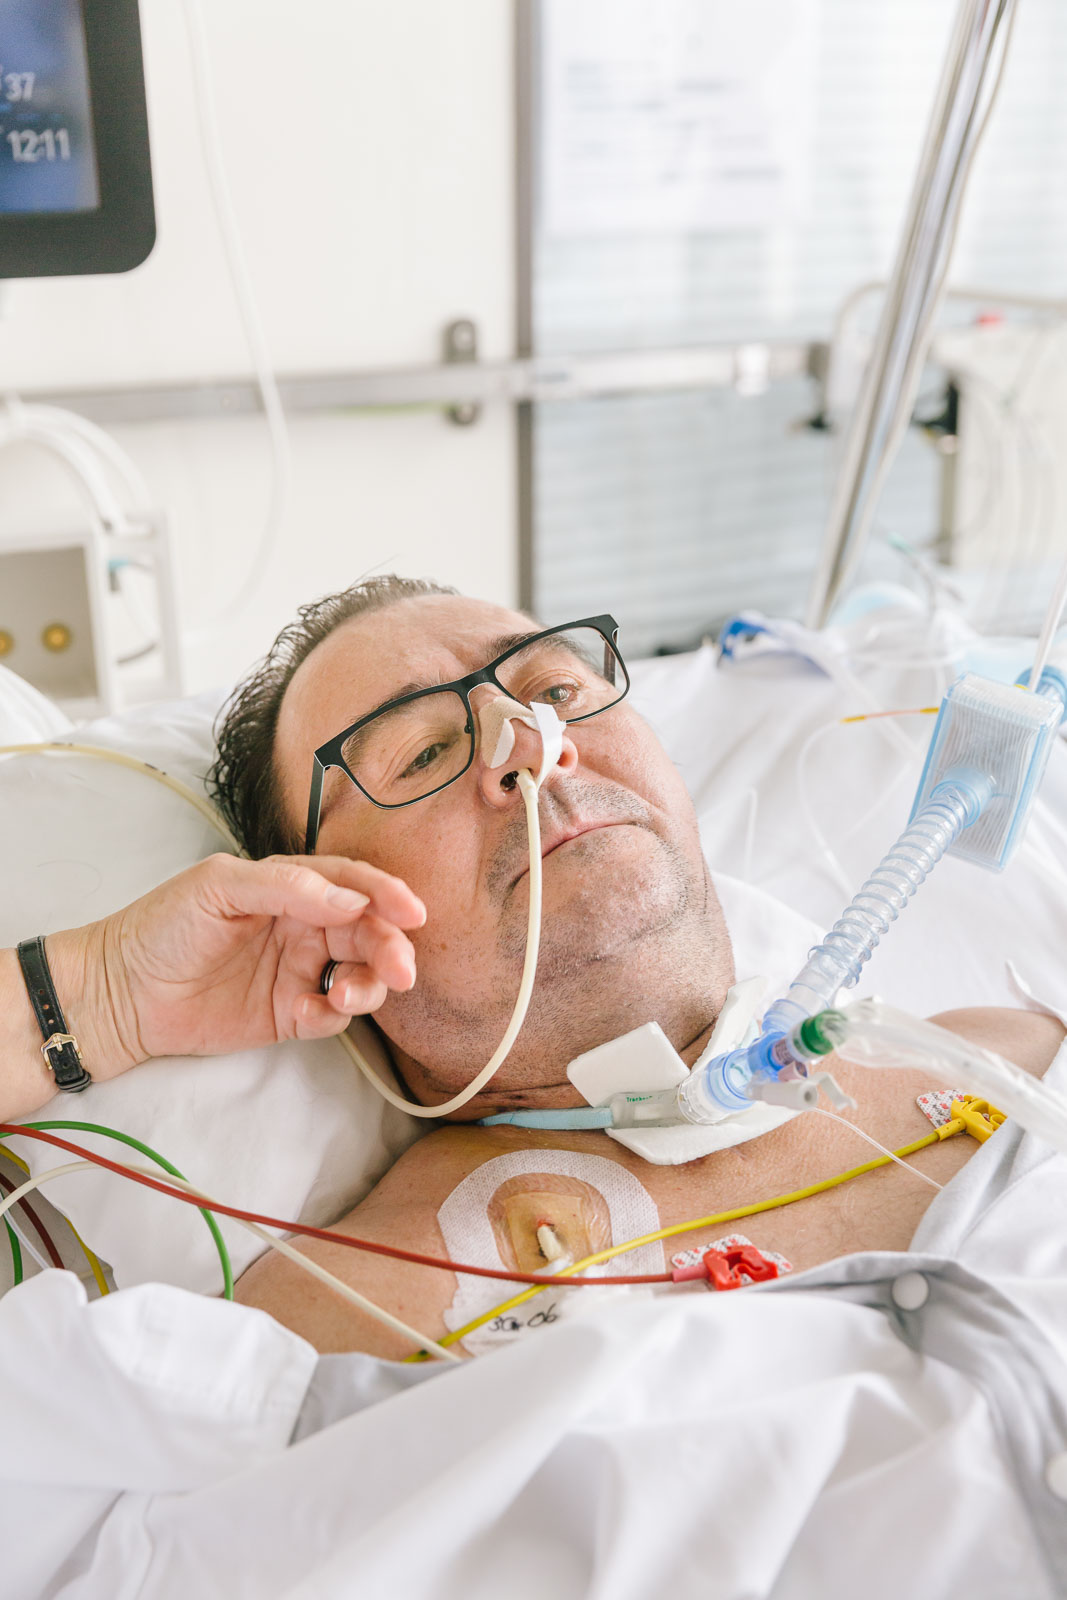 Herr H., COVID19-Patient